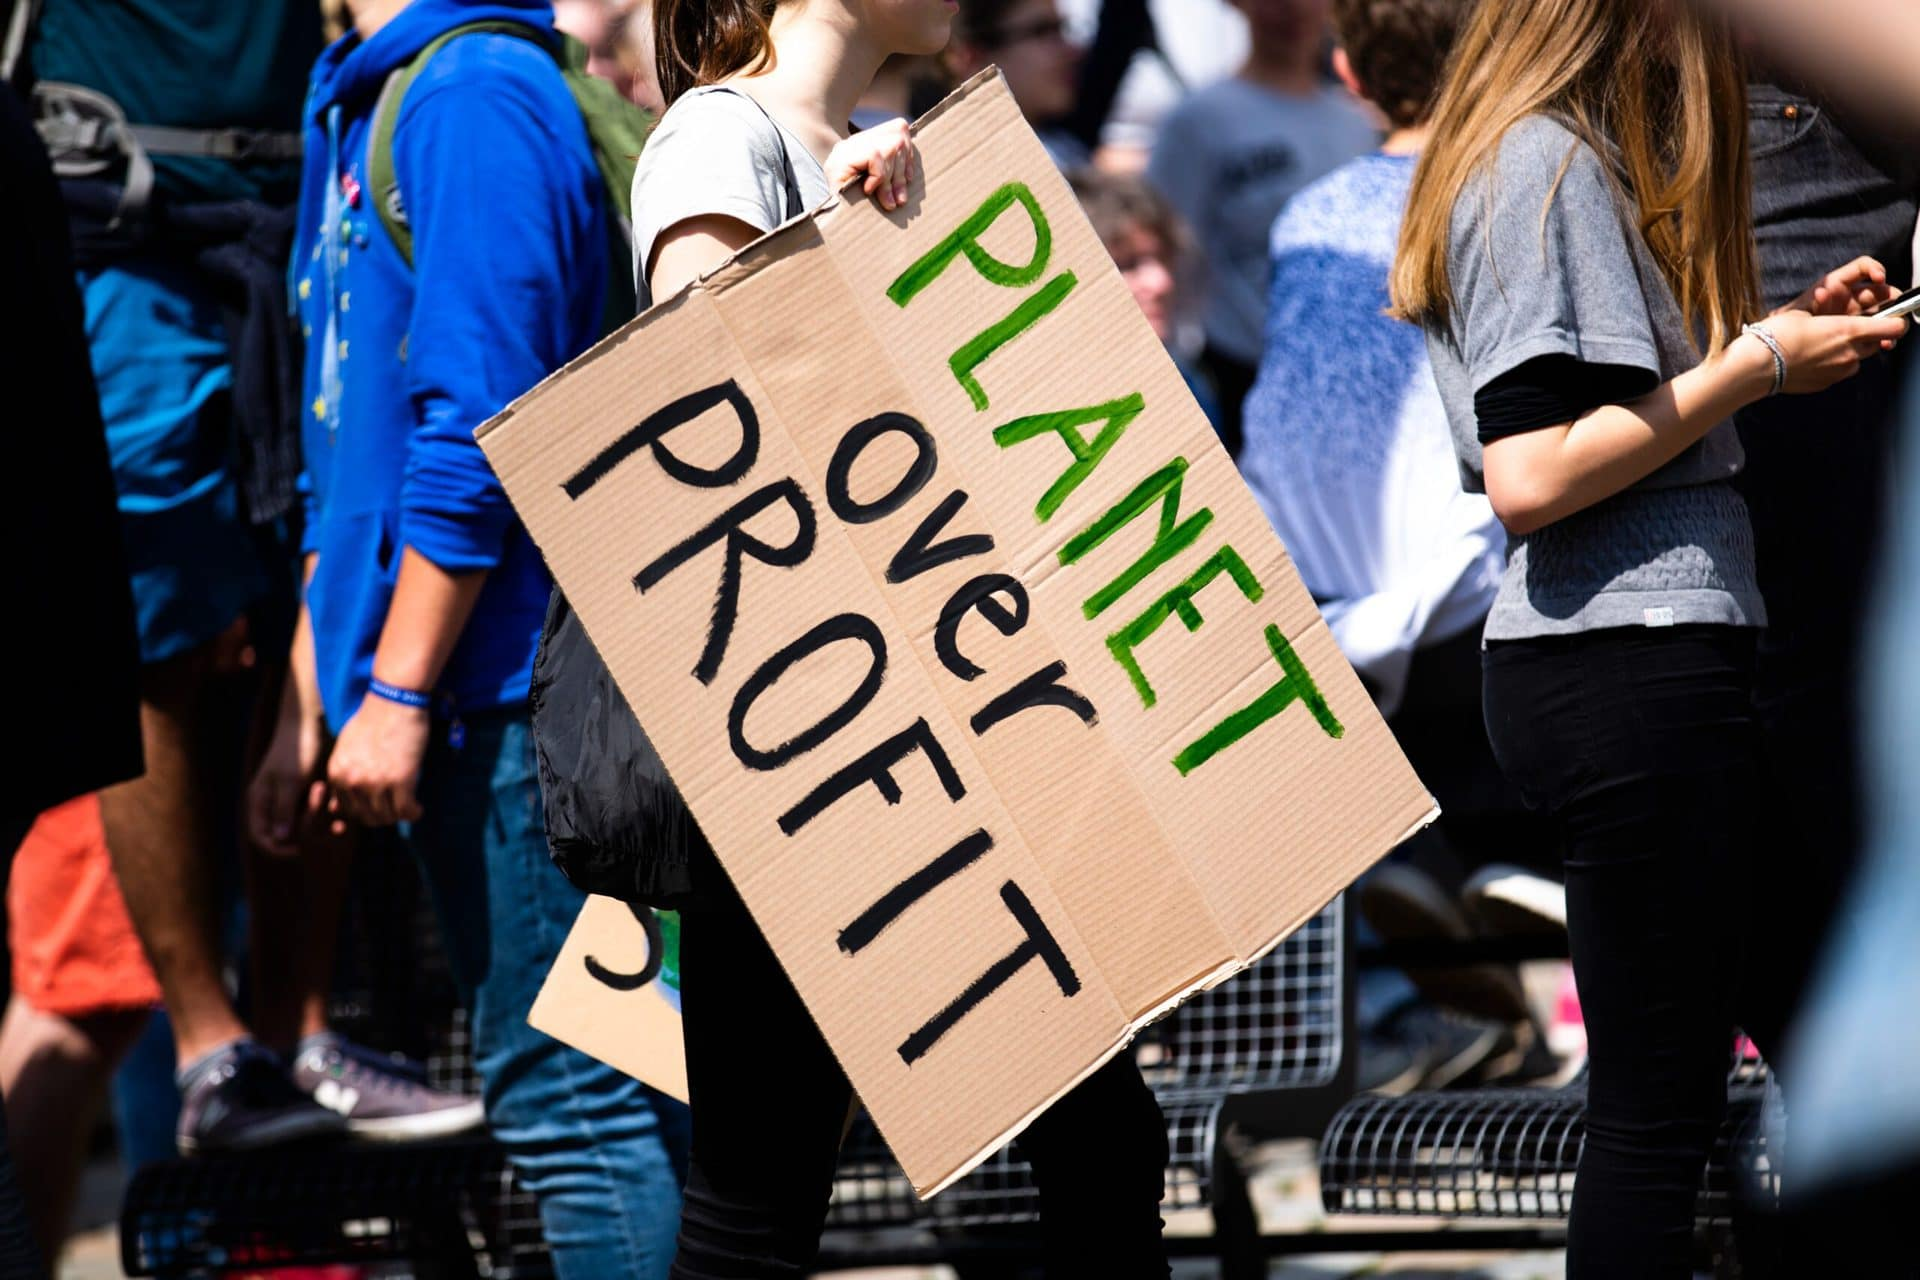 Pexels - CC - Markus Spiske - ,Planet over Profit'